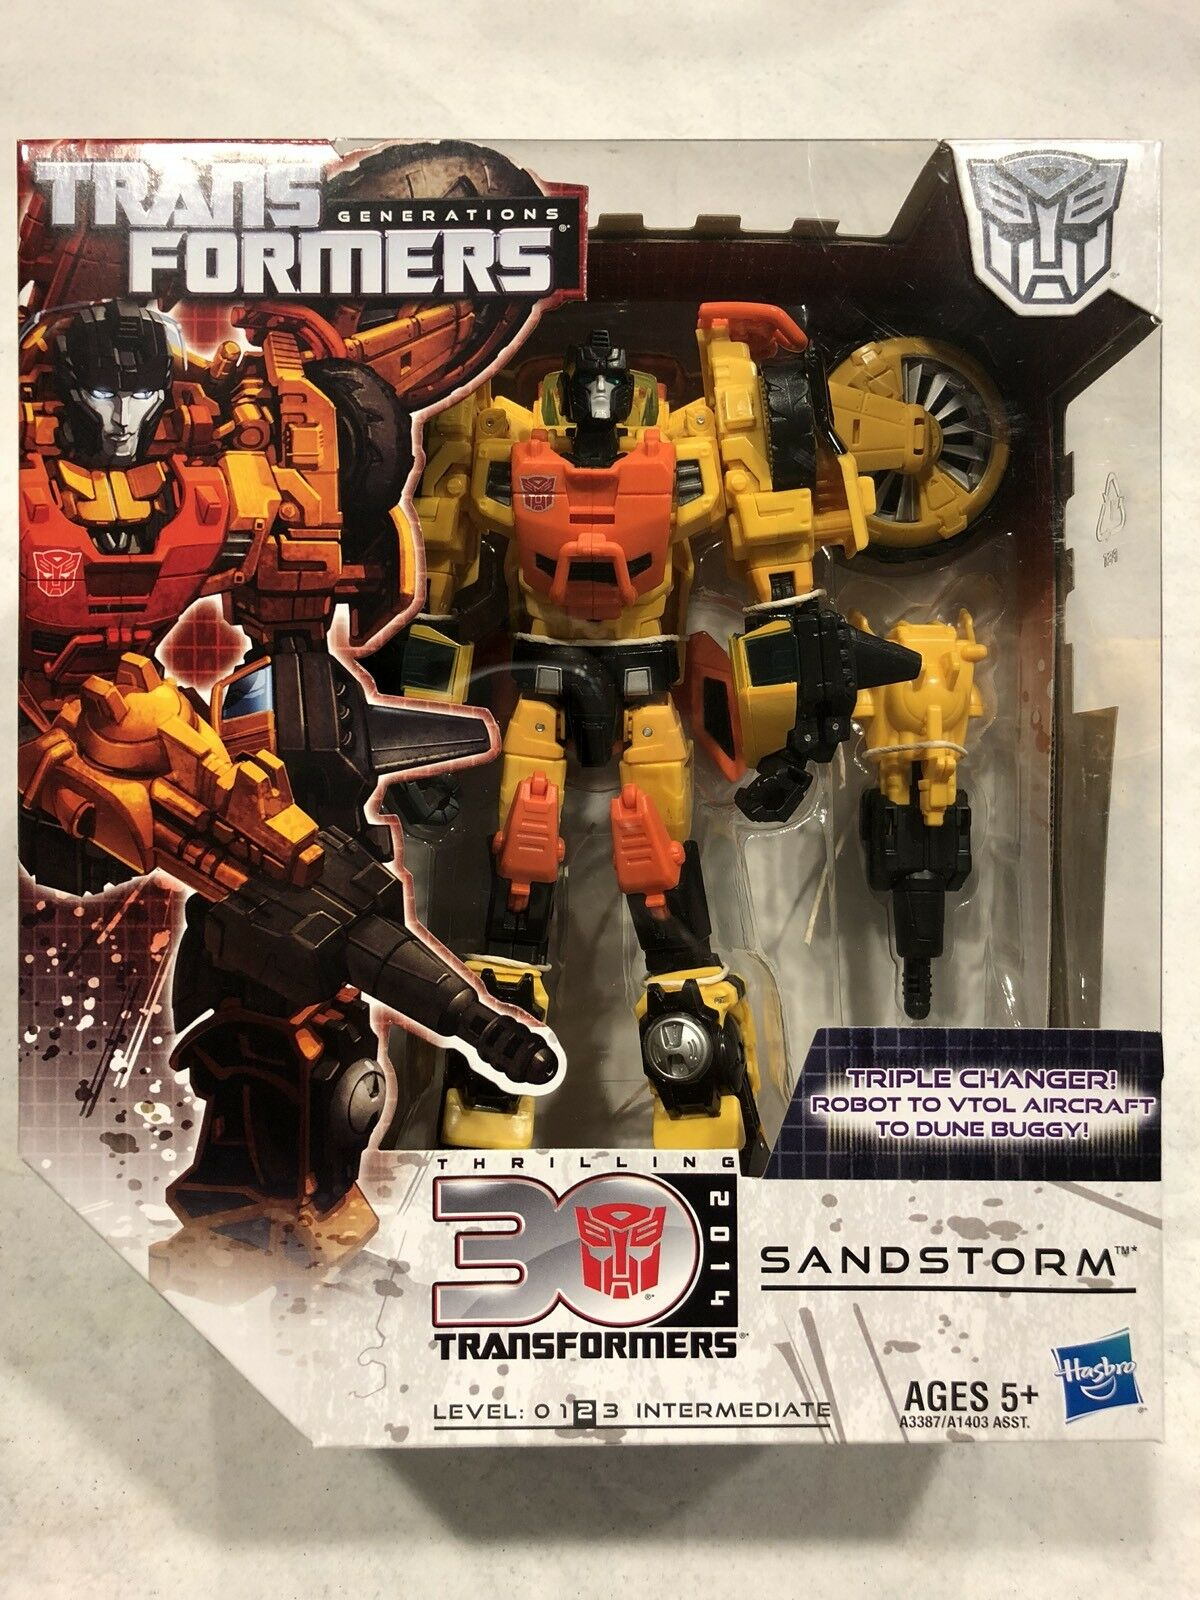 2013 Transformers G1 Classics 30th Generations Voyager Class SANDSTORM MISB